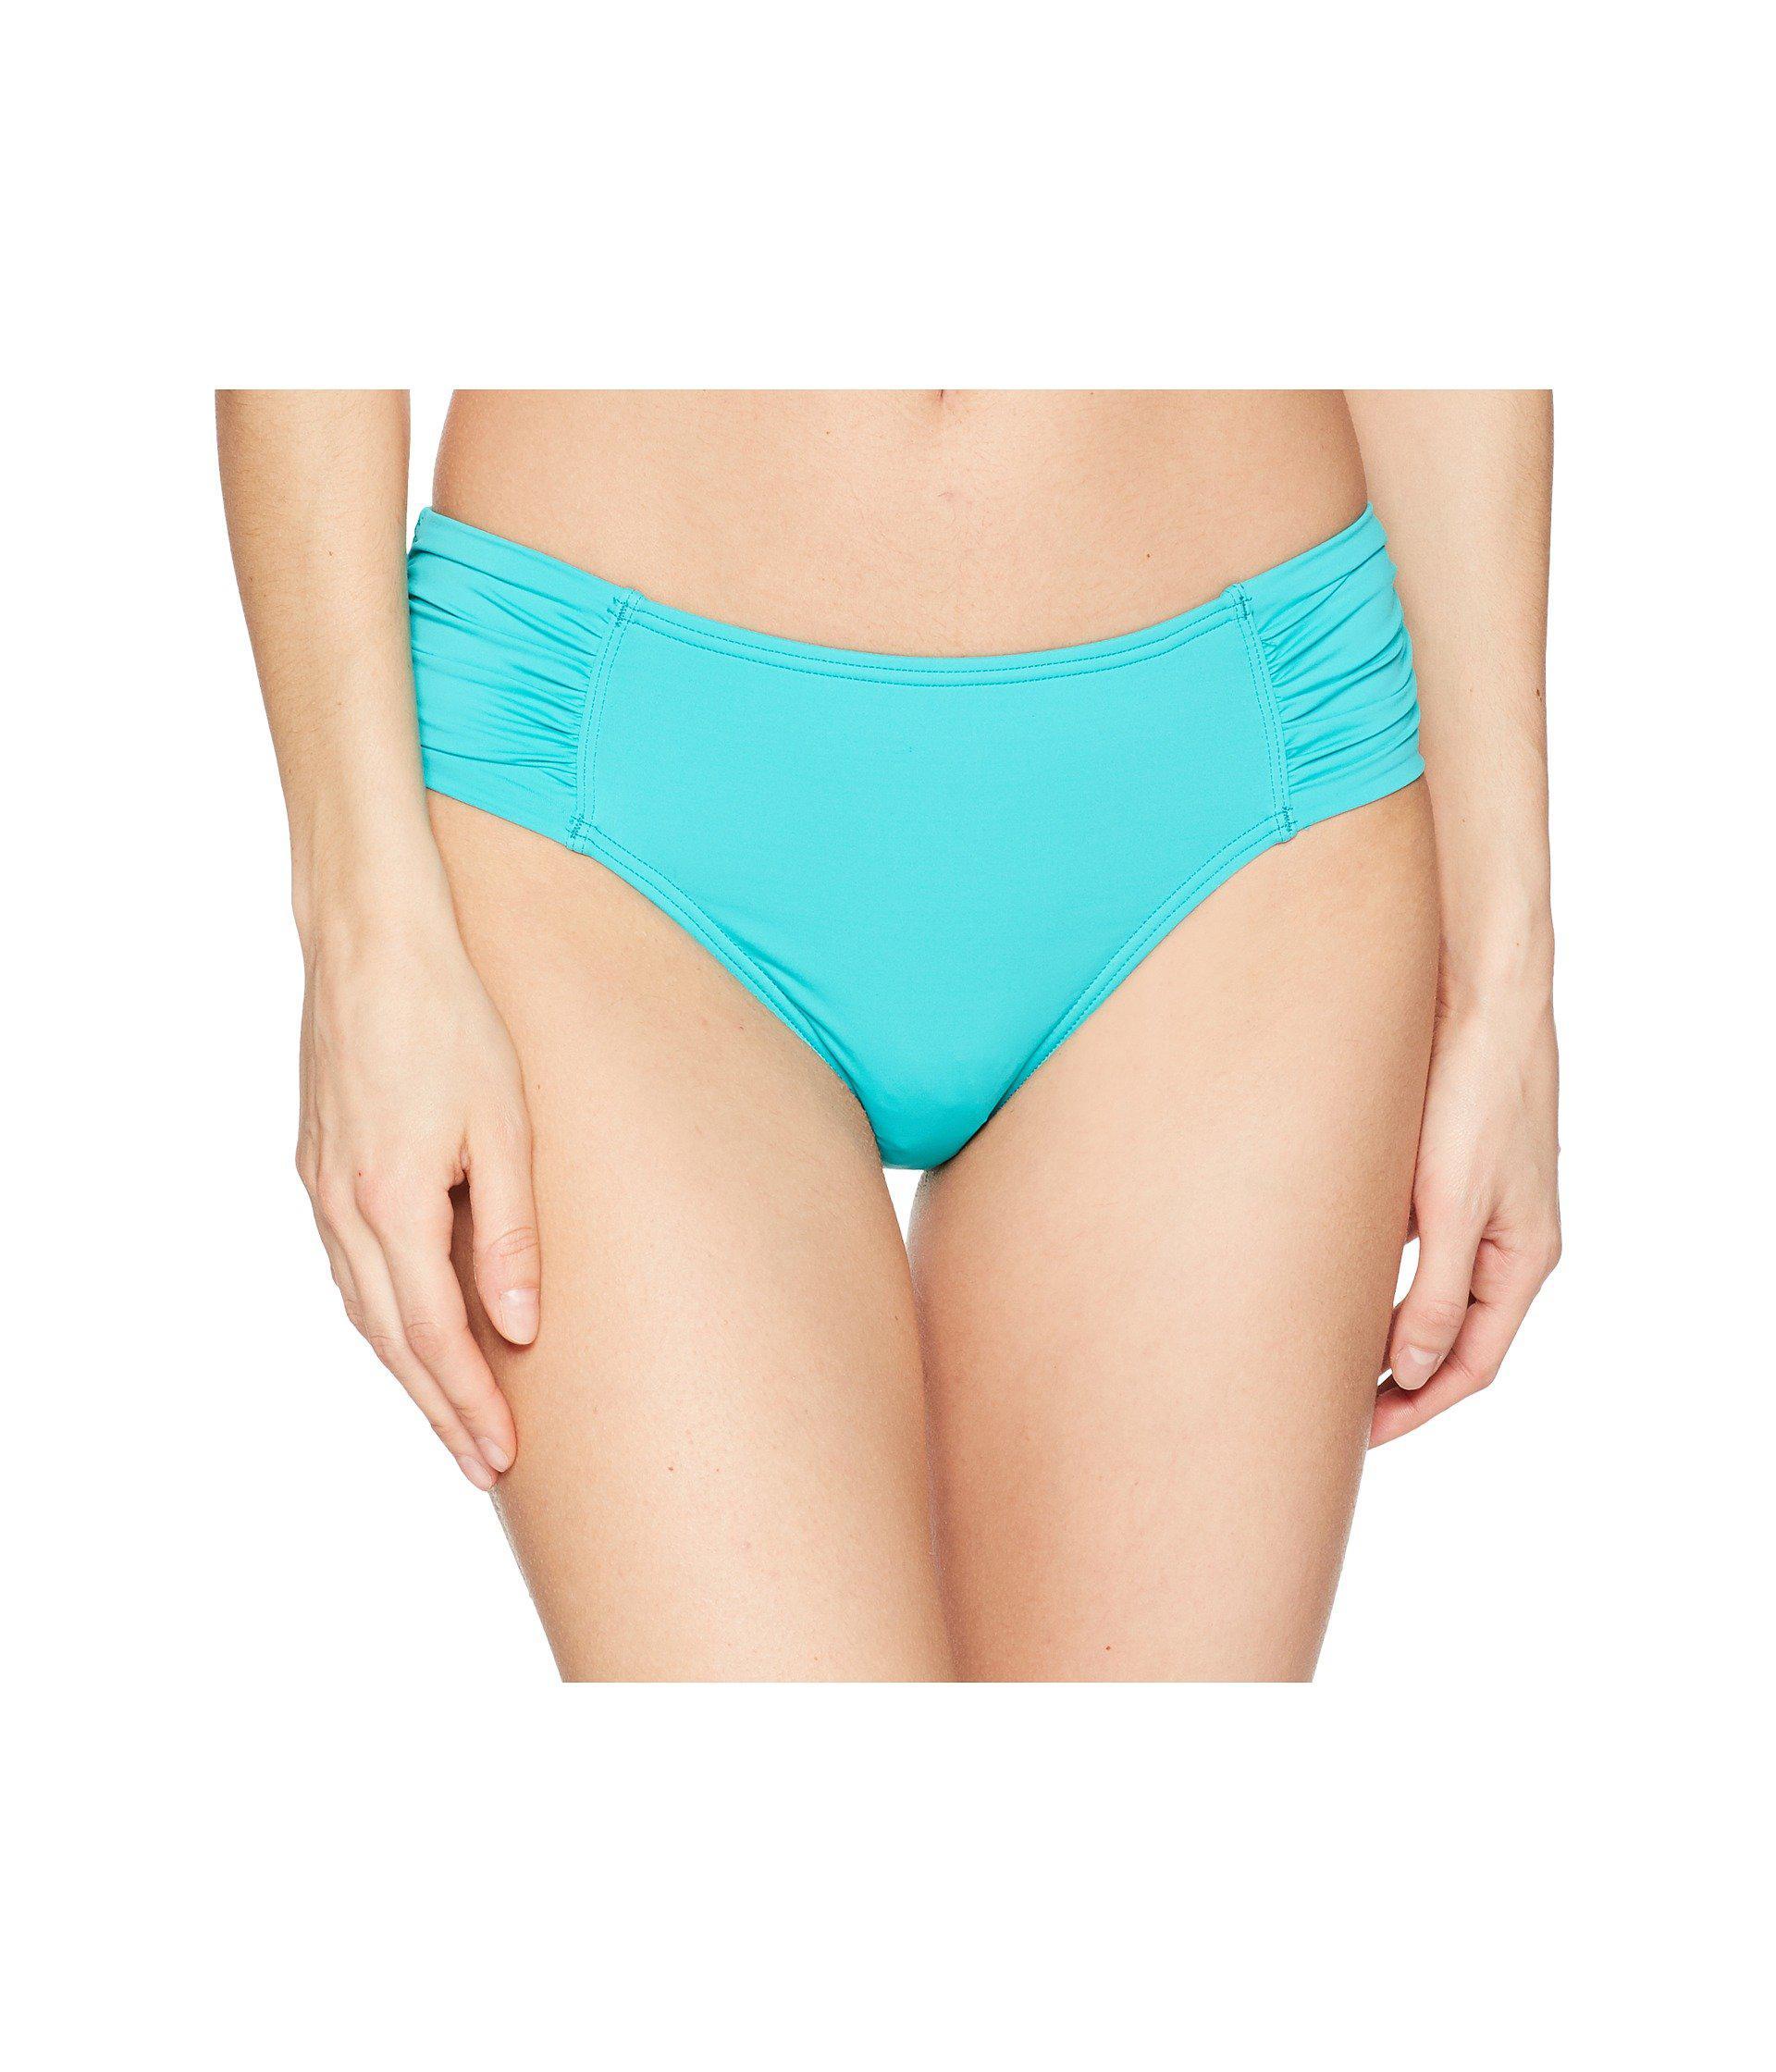 e05c4c7121c3c Lyst - Tommy Bahama Pearl High-waist Side-shirred Bikini Bottom in ...